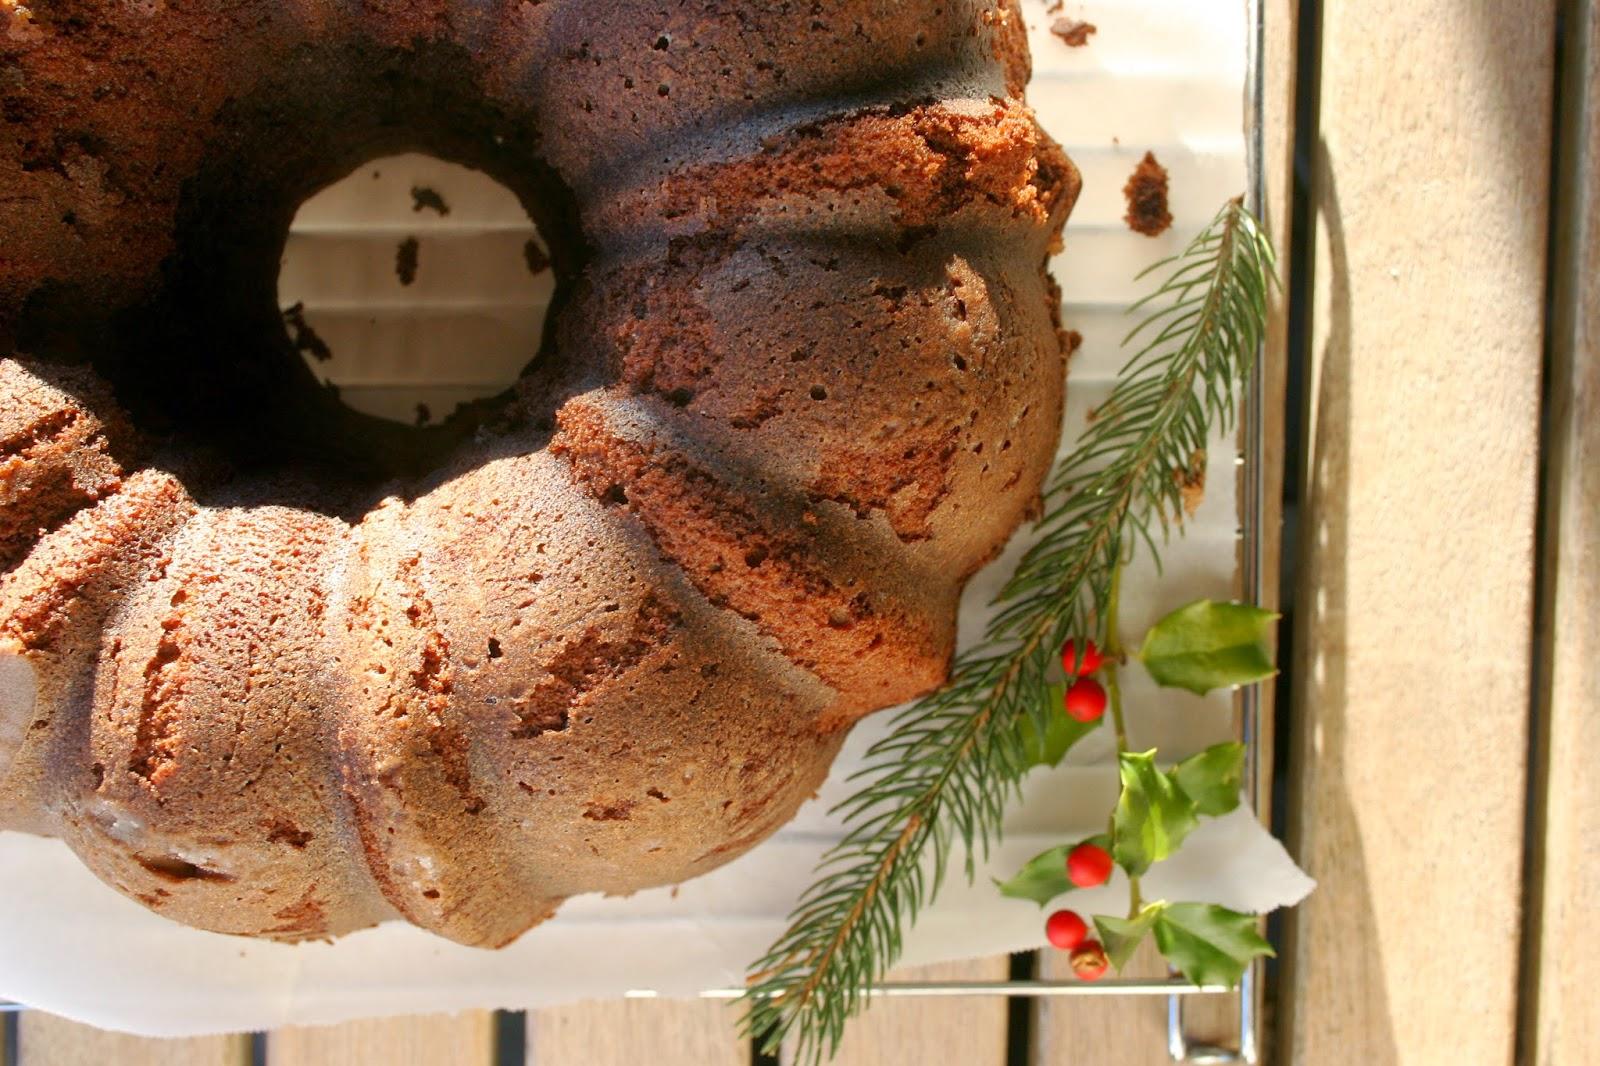 Whiskey-Soaked Dark Chocolate Bundt Cake for Christmas